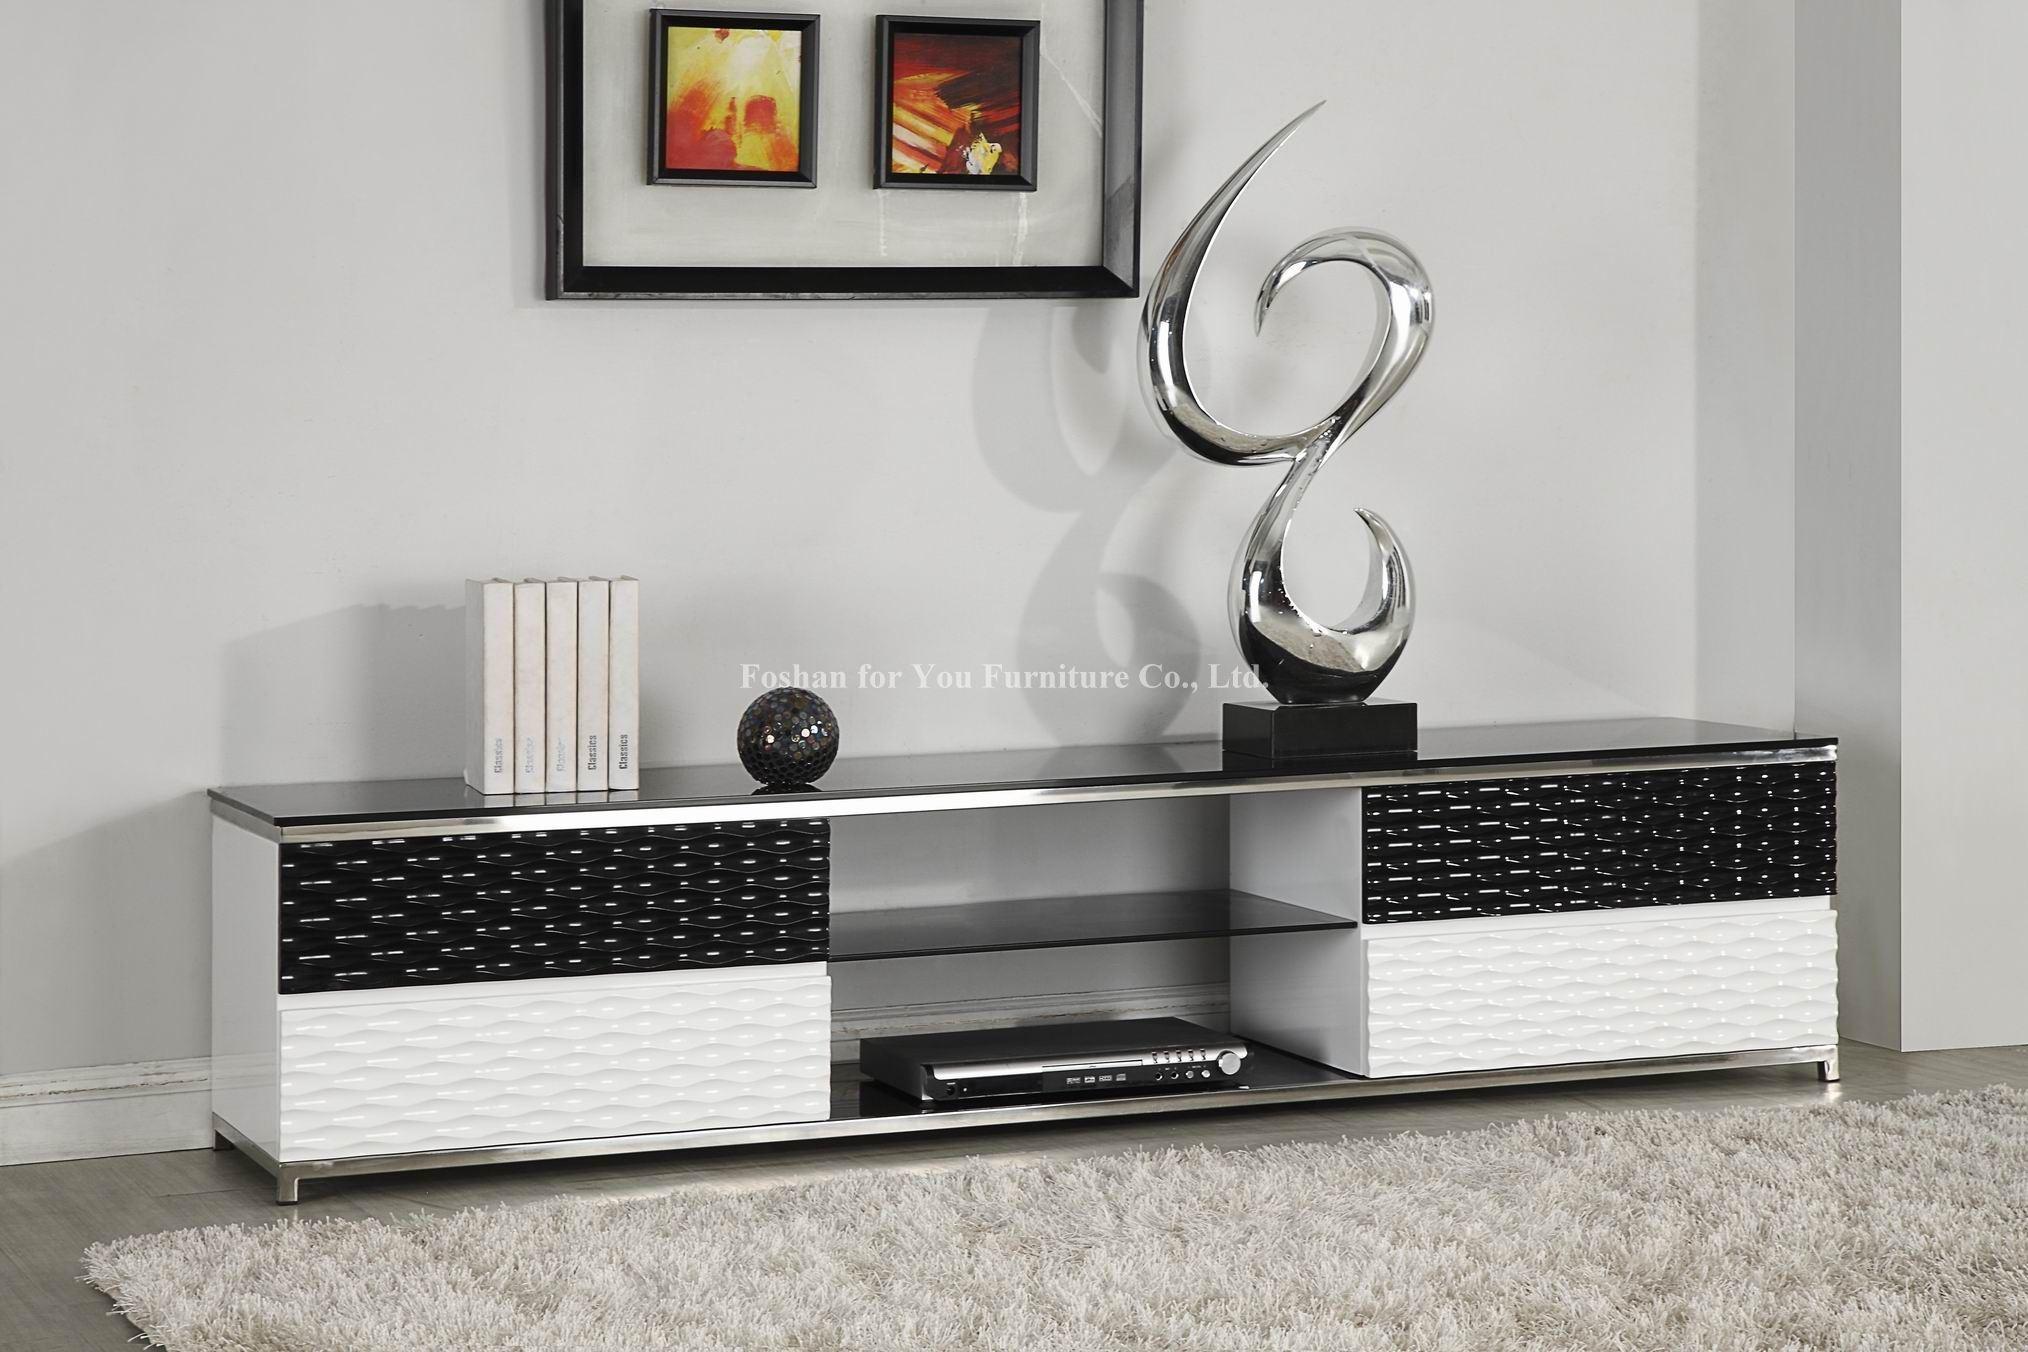 Living Room Decorating Ideas Tv Stand Interior Design Part 82